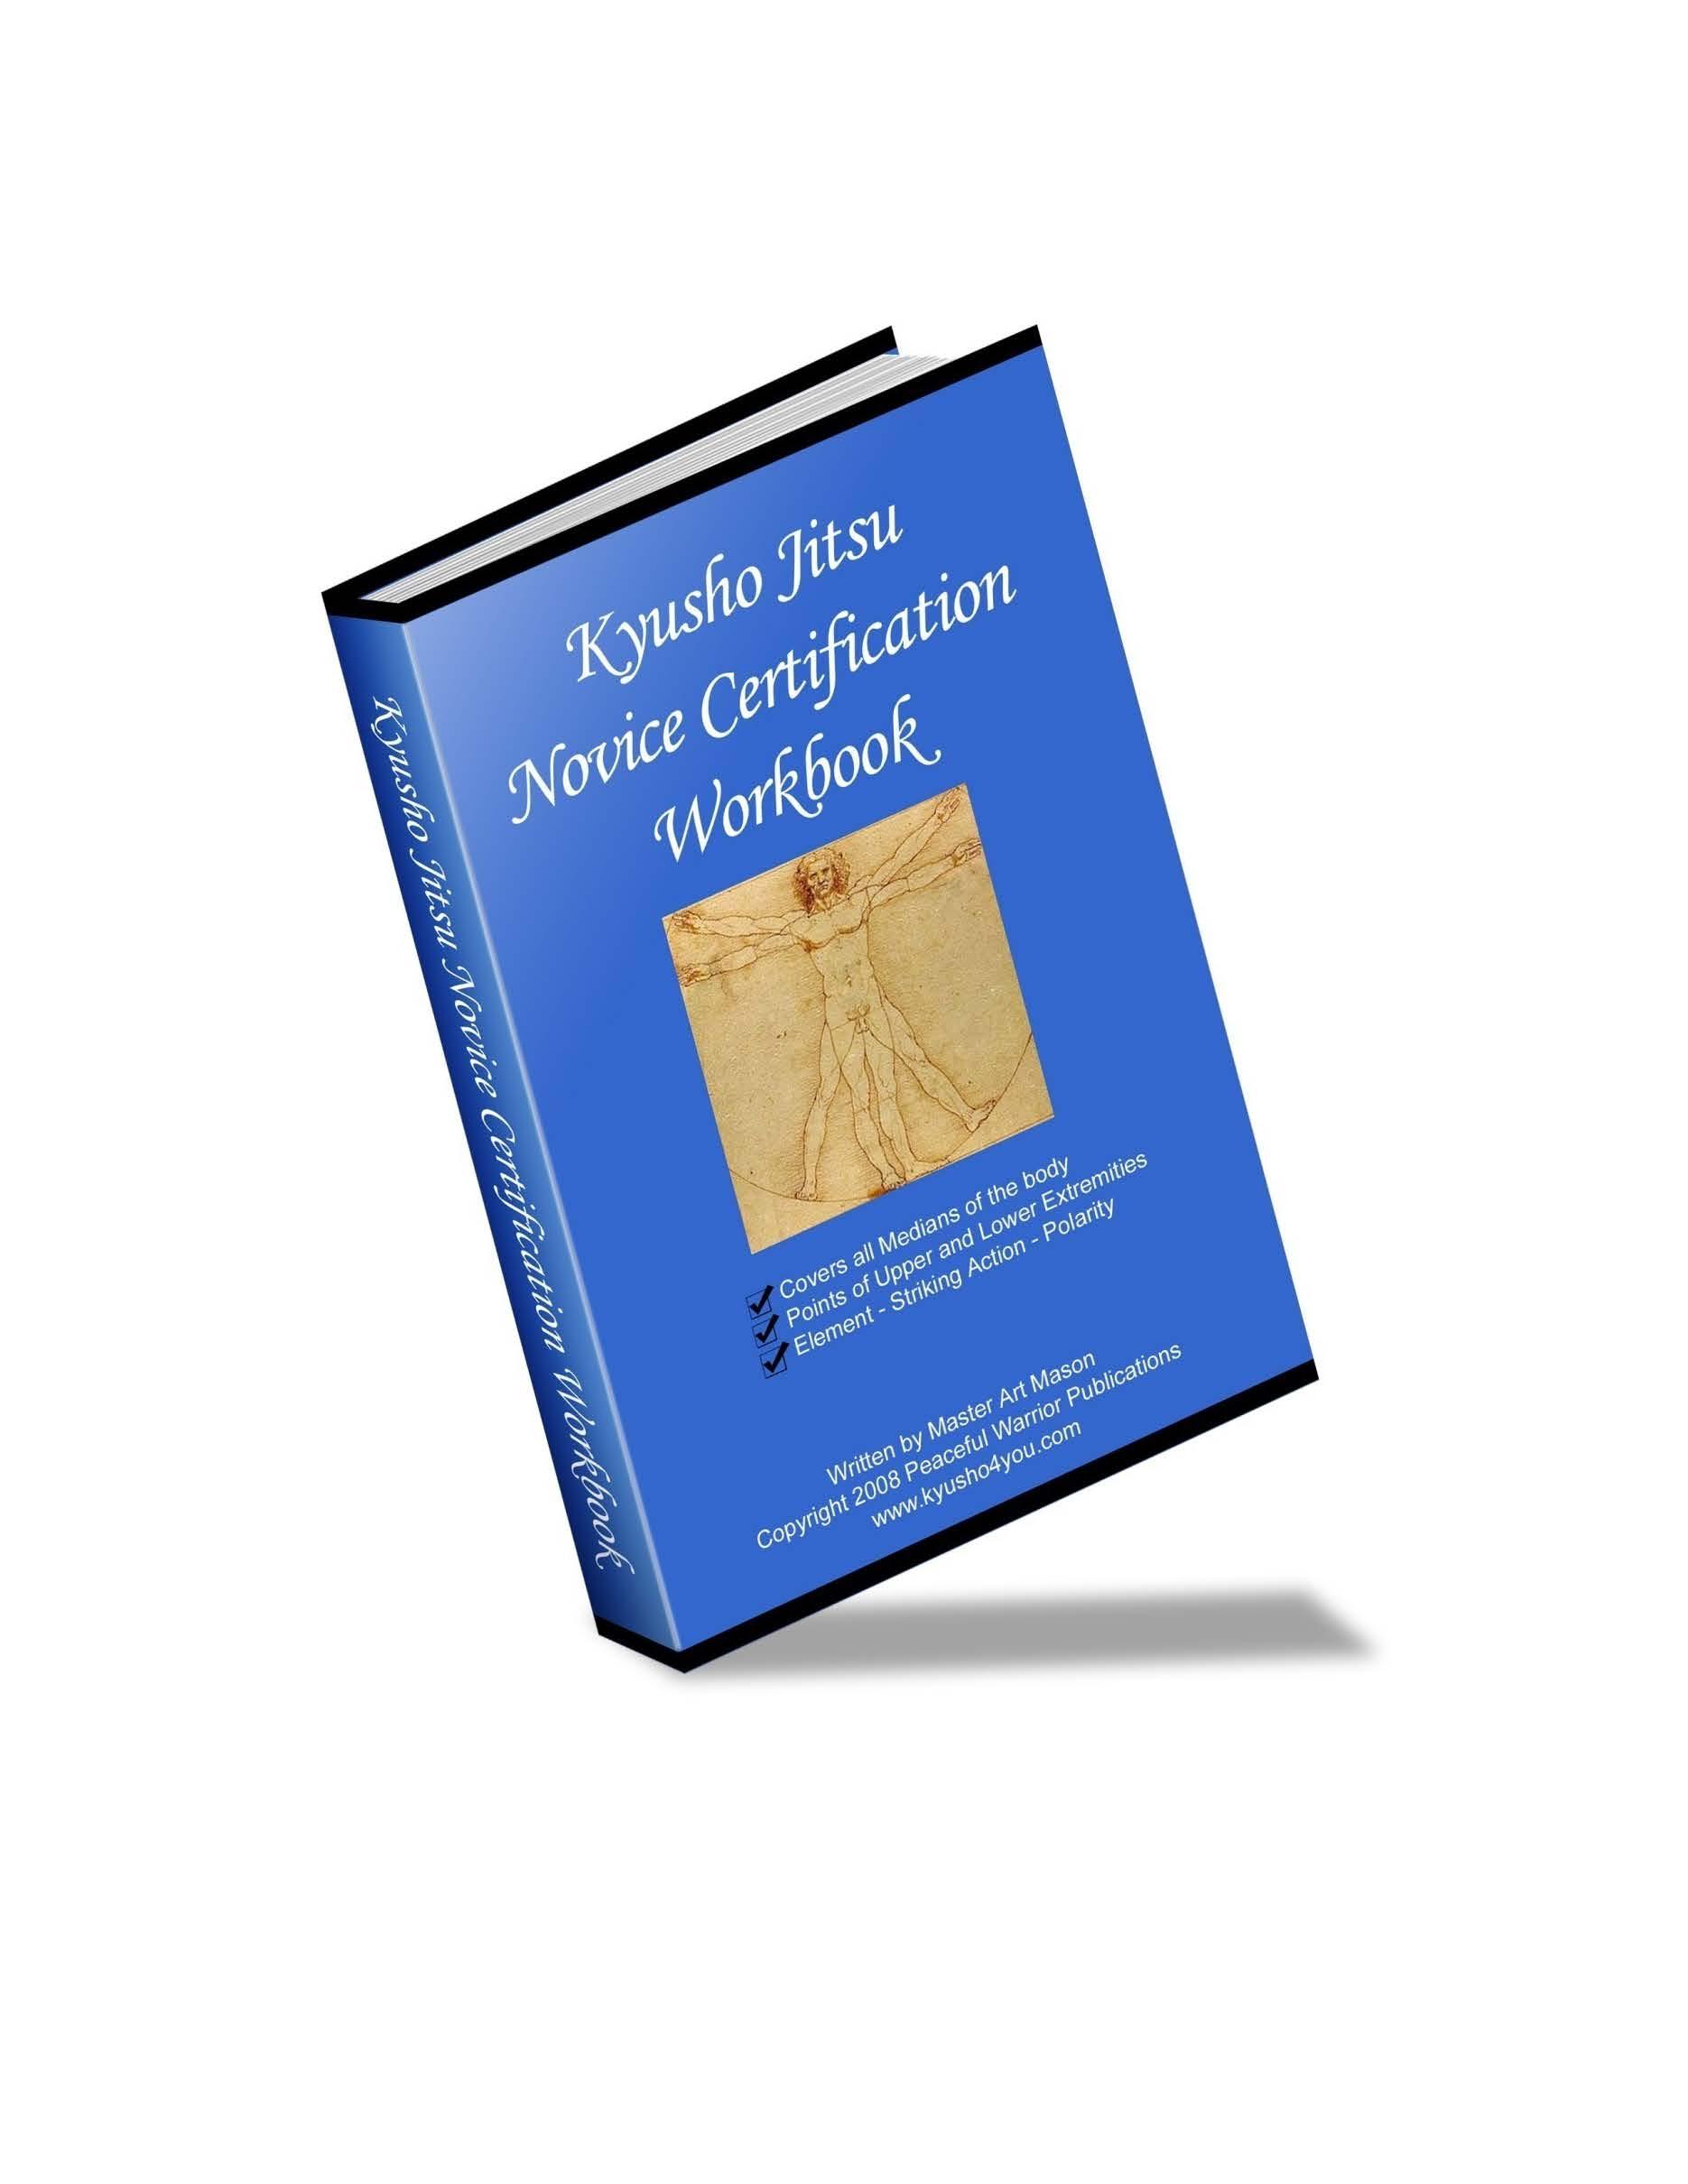 Array - philips rc9800i manual ebook  rh   philips rc9800i manual ebook zettadata solutions